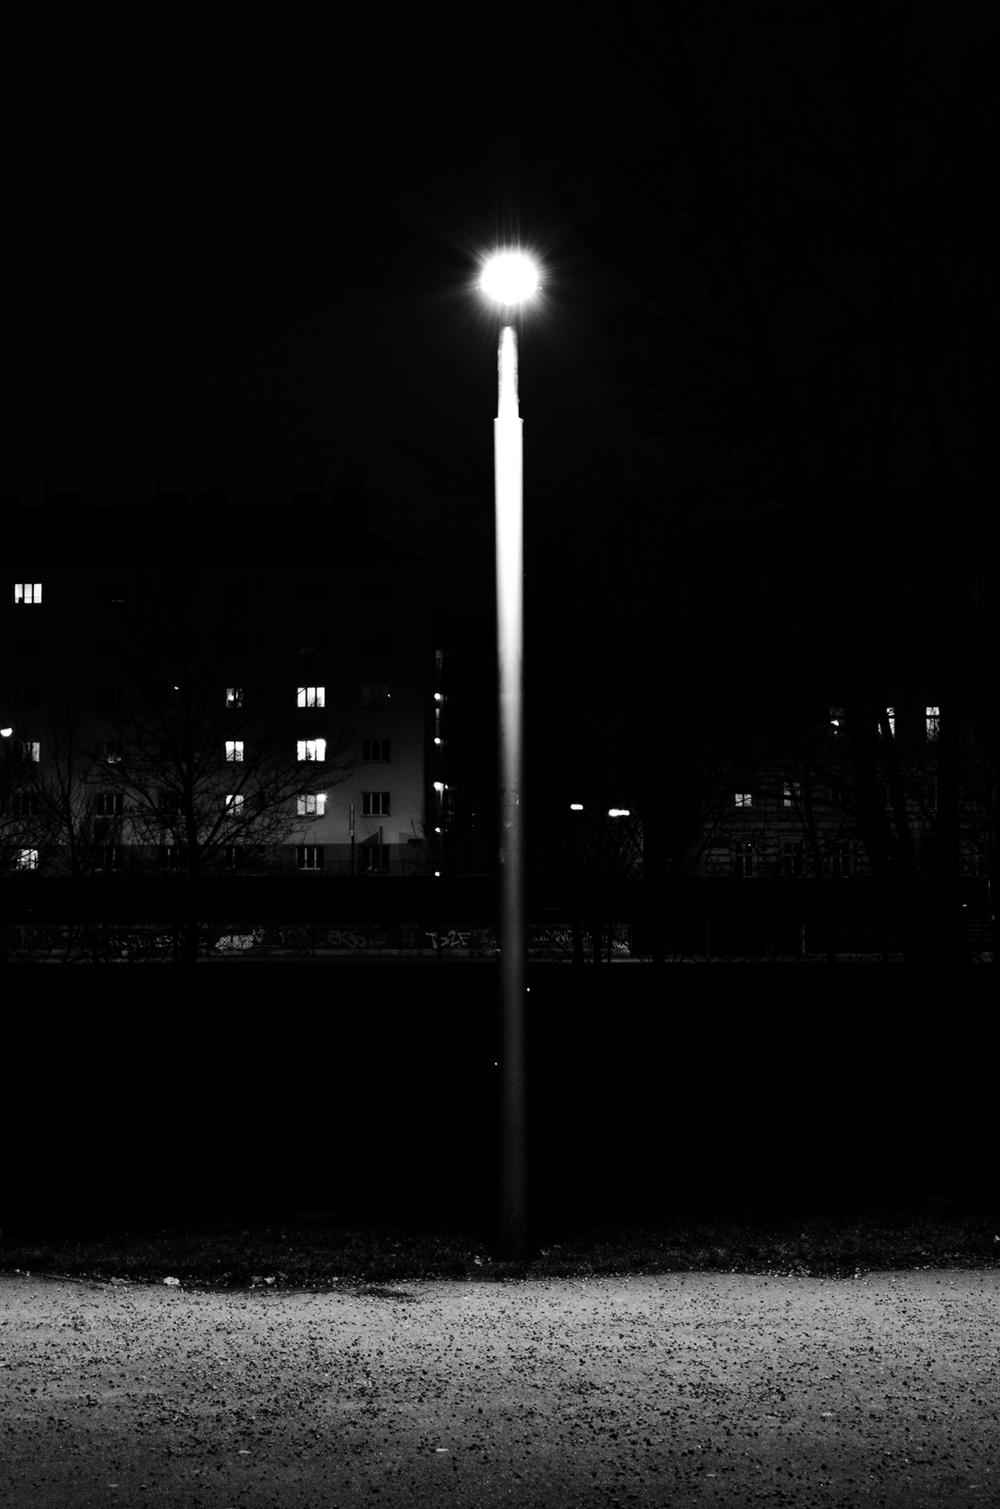 Project 365: #36 - Light